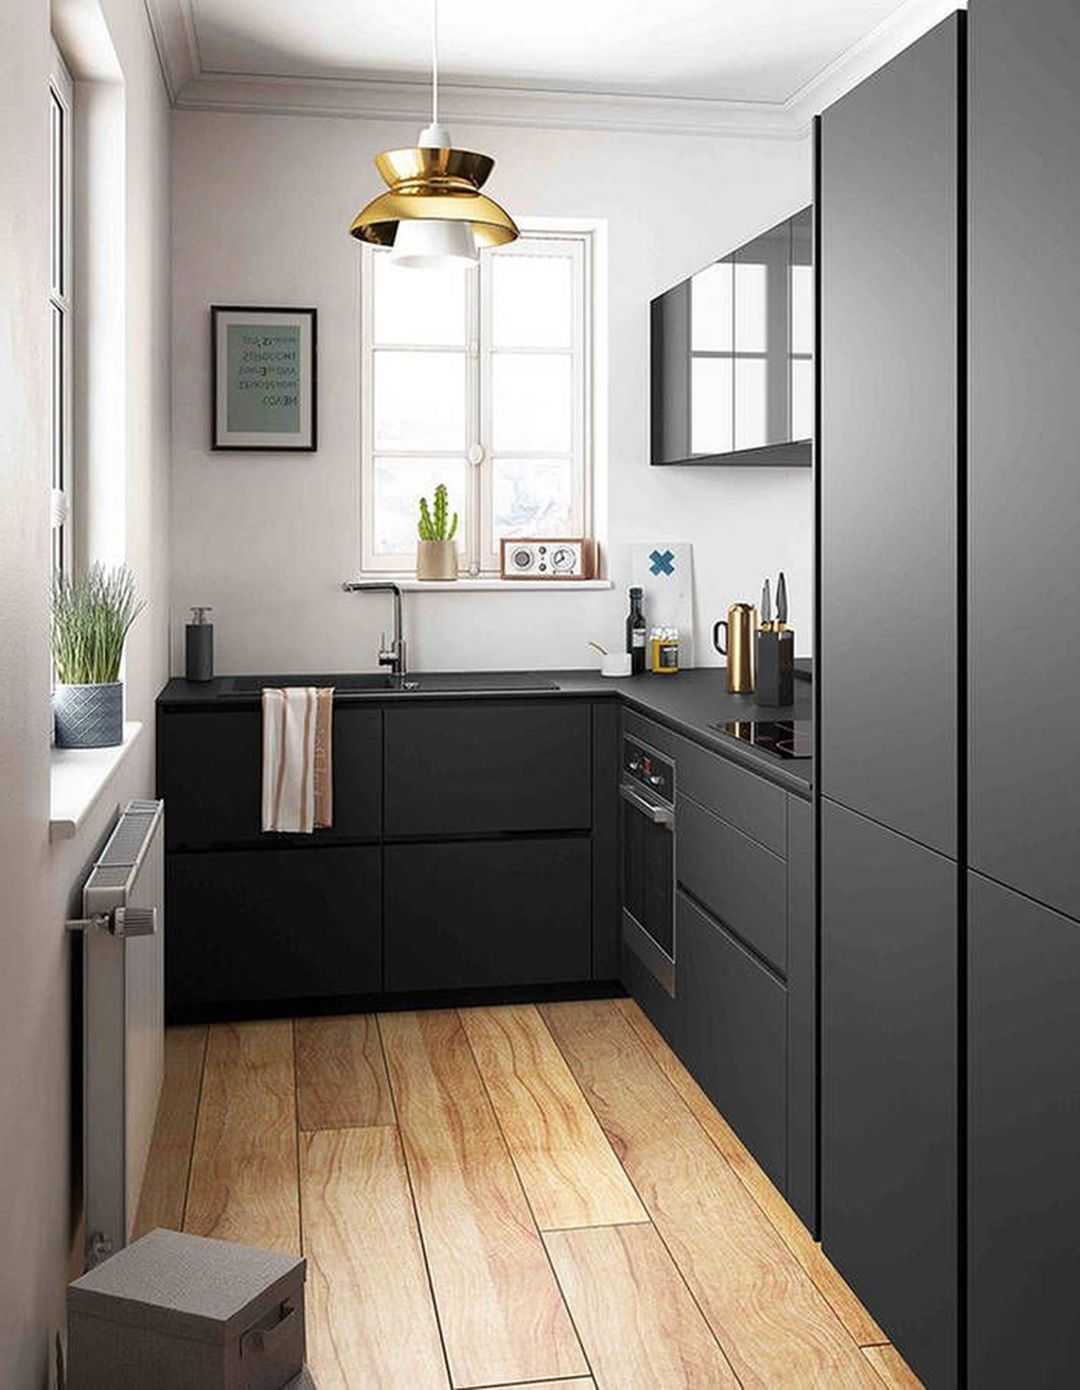 2020 small modern kitchen ideas small modern kitchens small apartment kitchen modern kitchen on kitchen ideas modern id=65381